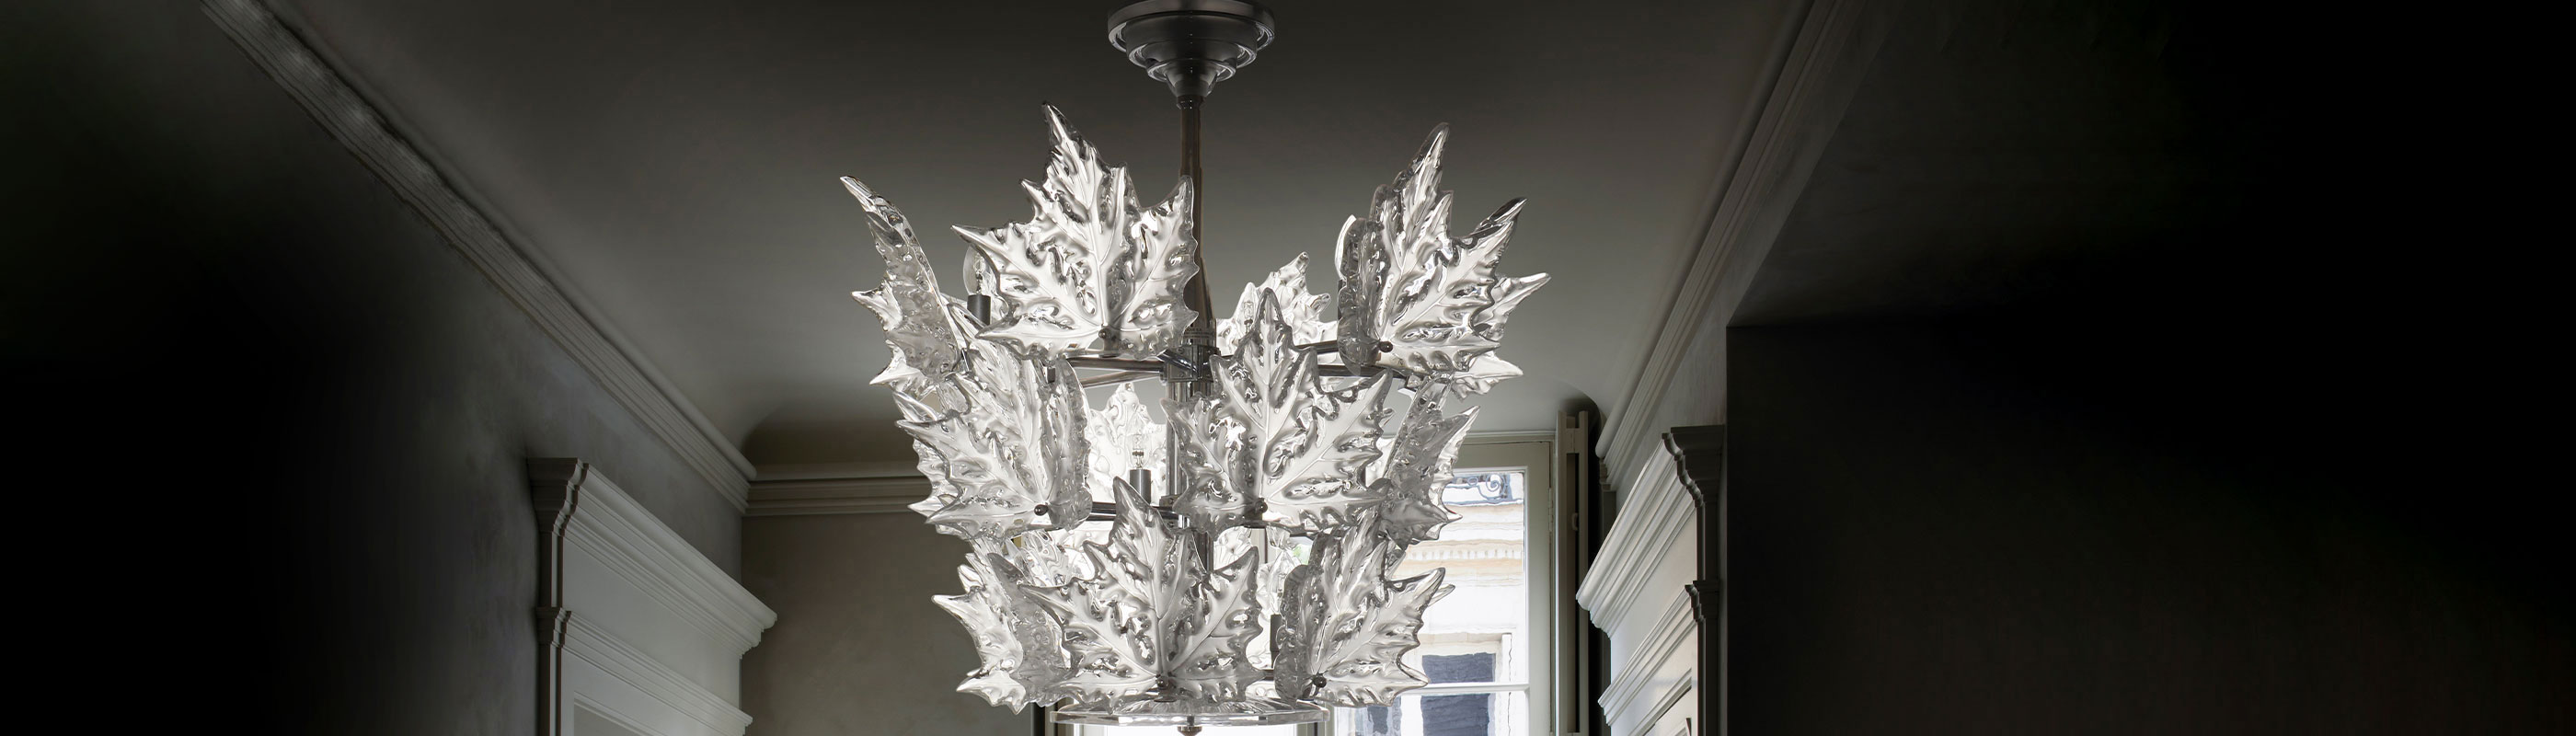 Lighting Lamps Chandeliers Ceiling